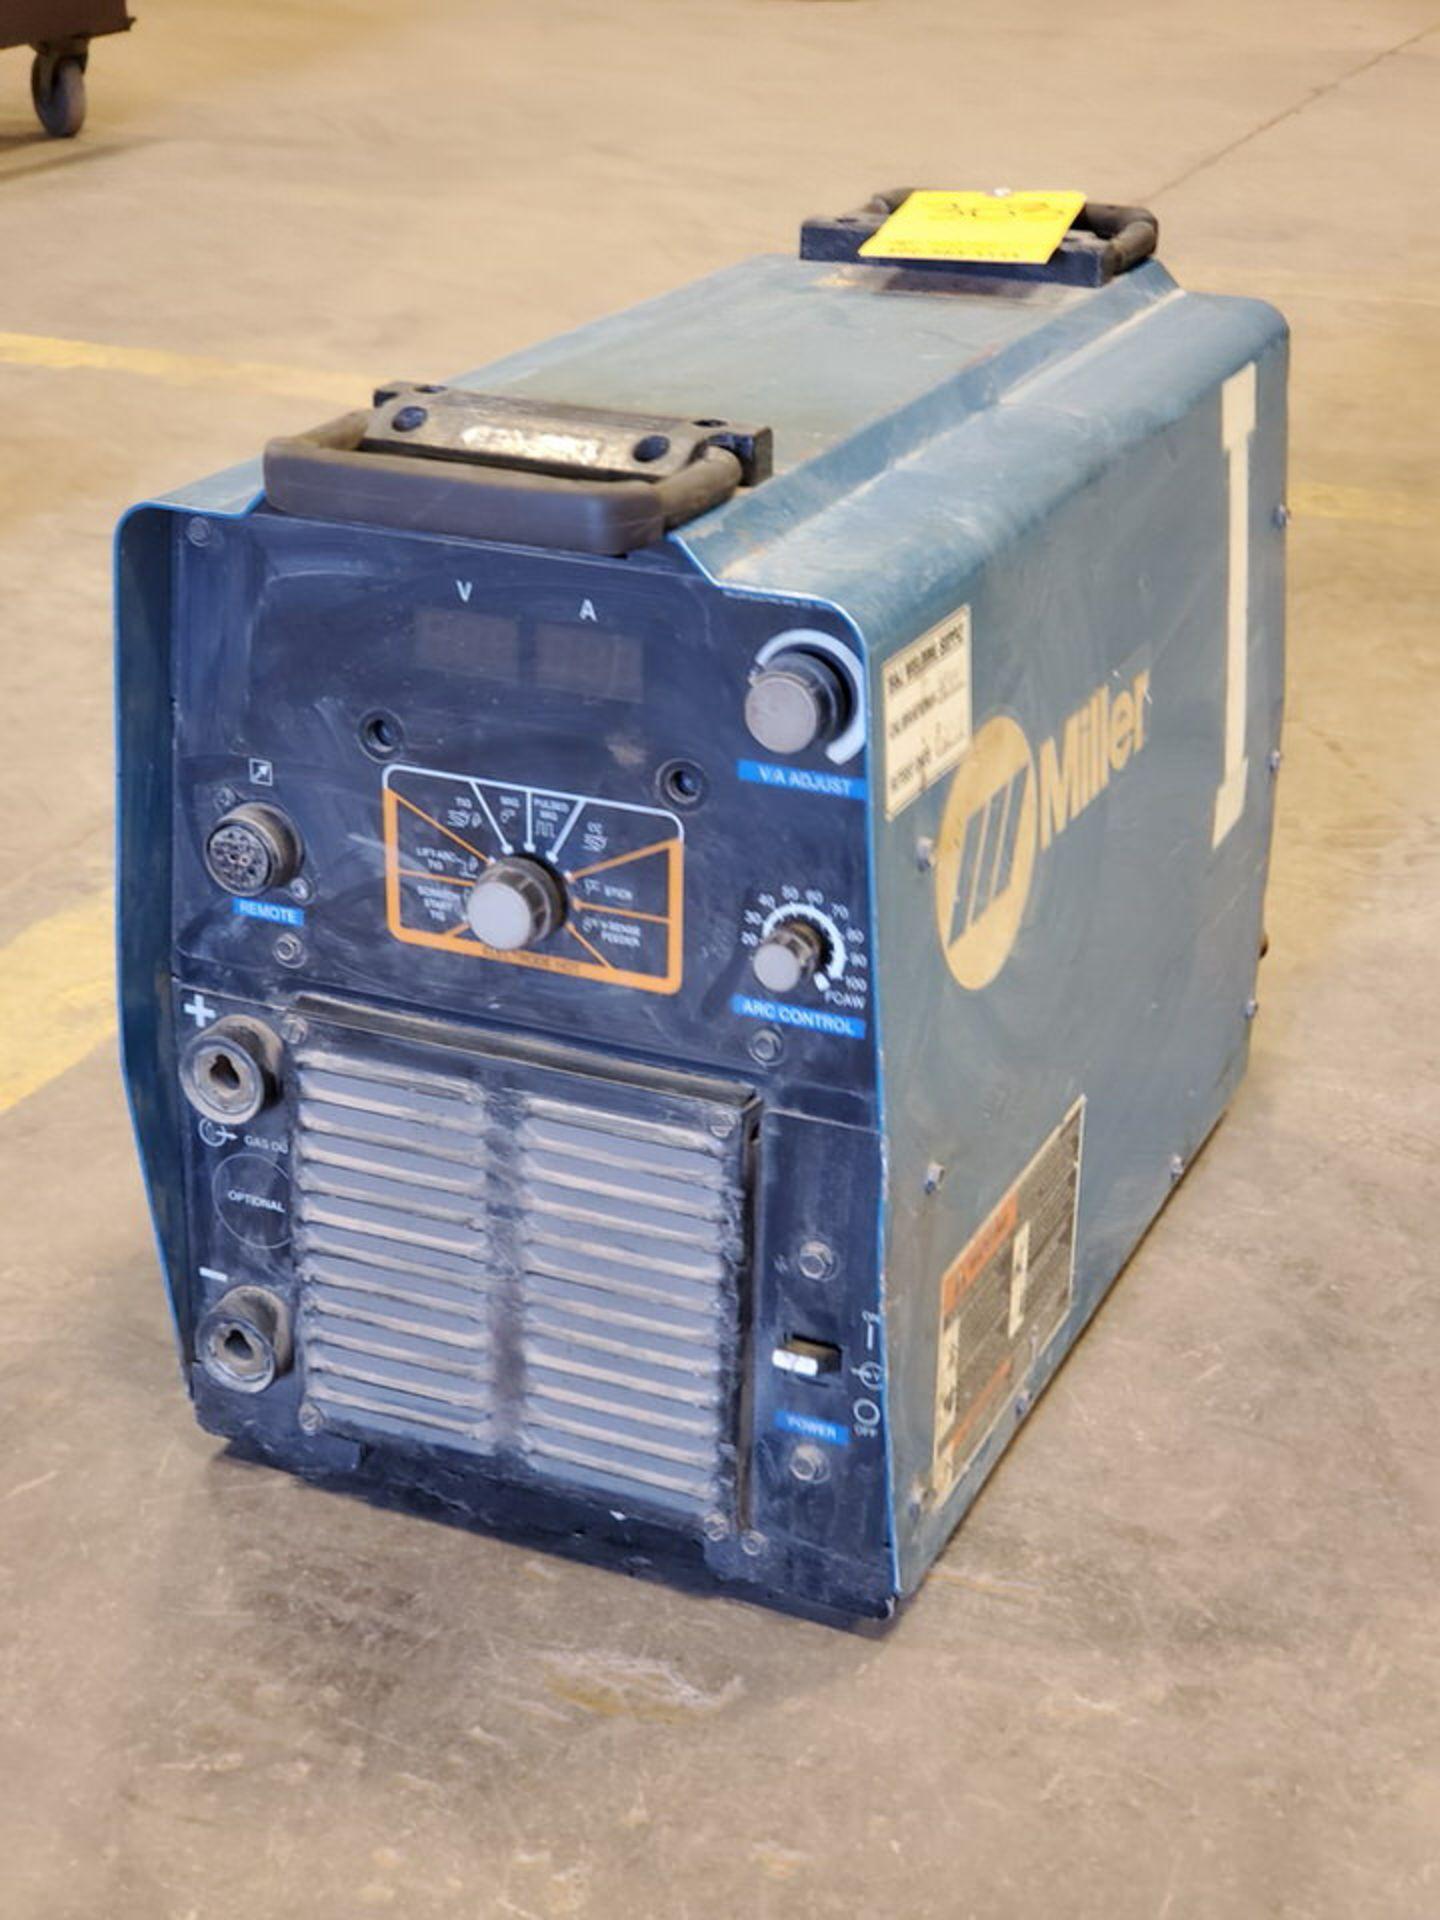 Miller Plasma Cutter 208-575V, 1/3PH, 50/60HZ - Image 2 of 5